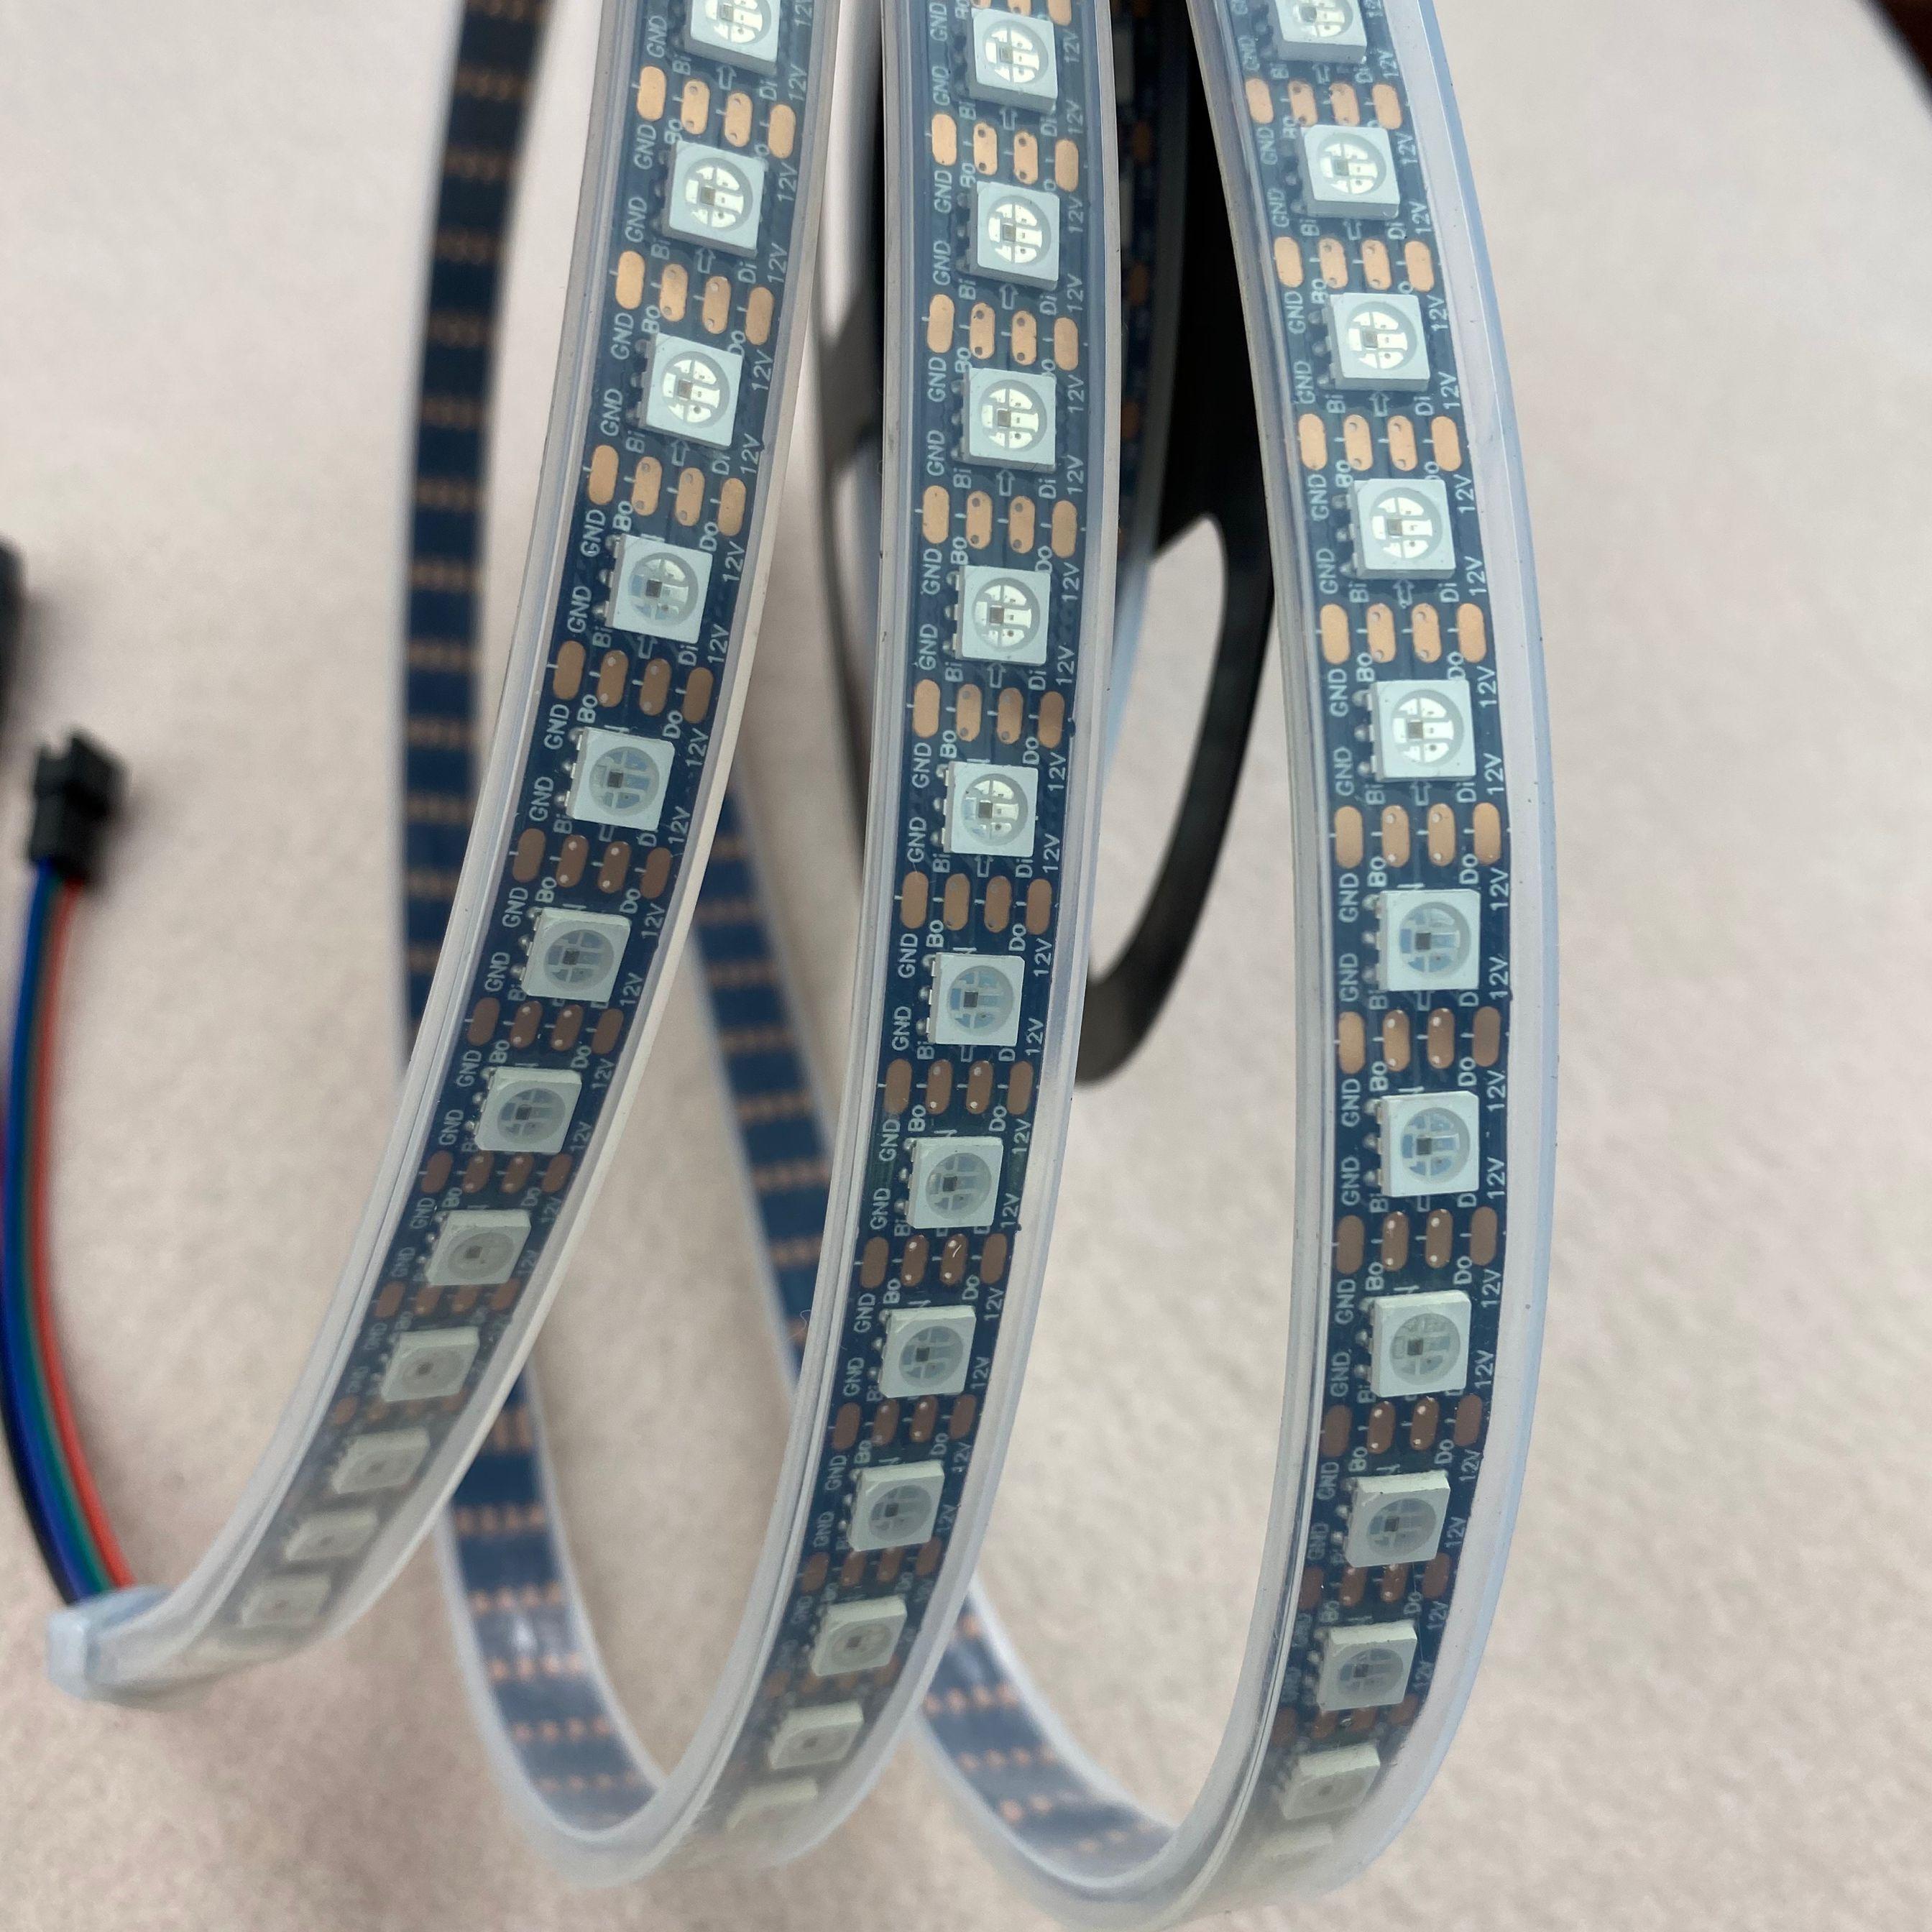 PRETO PCB 96 60leds/m WS2815 DC12V endereçável full color RGB 5050 tira CONDUZIDA; 3m/reel; à prova d água no tubo de silicone; IP66